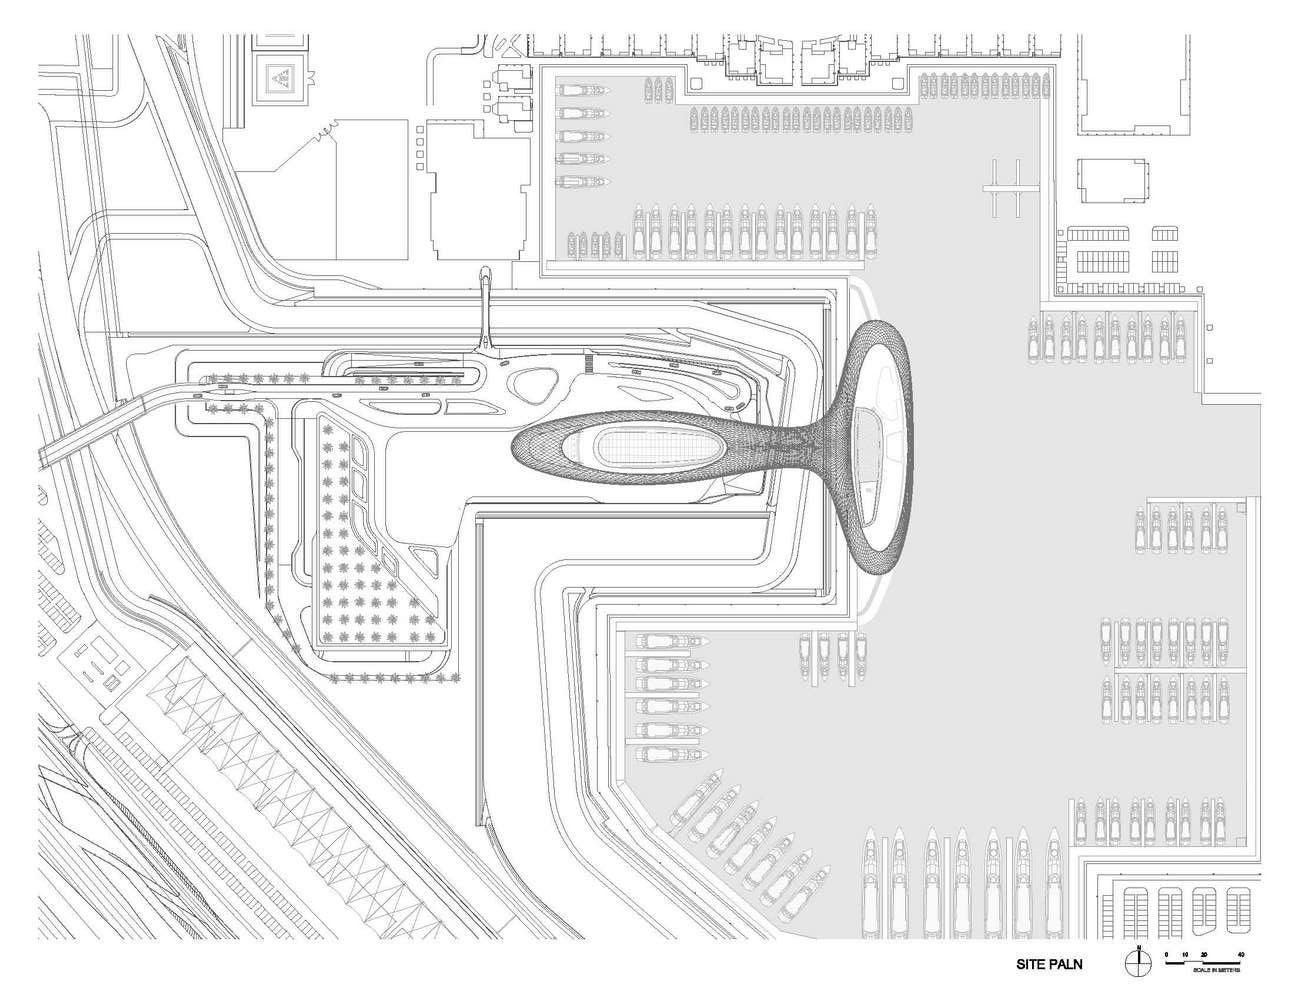 Viceroy Floor Plans Digital Architecture Bit Box